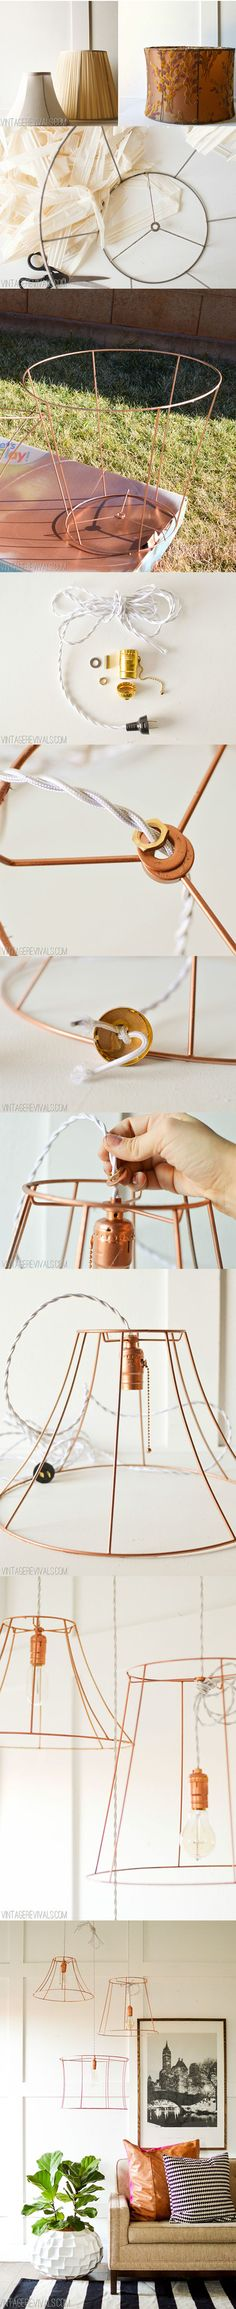 Sencilla lámpara DIY / http://www.vintagerevivals.com/